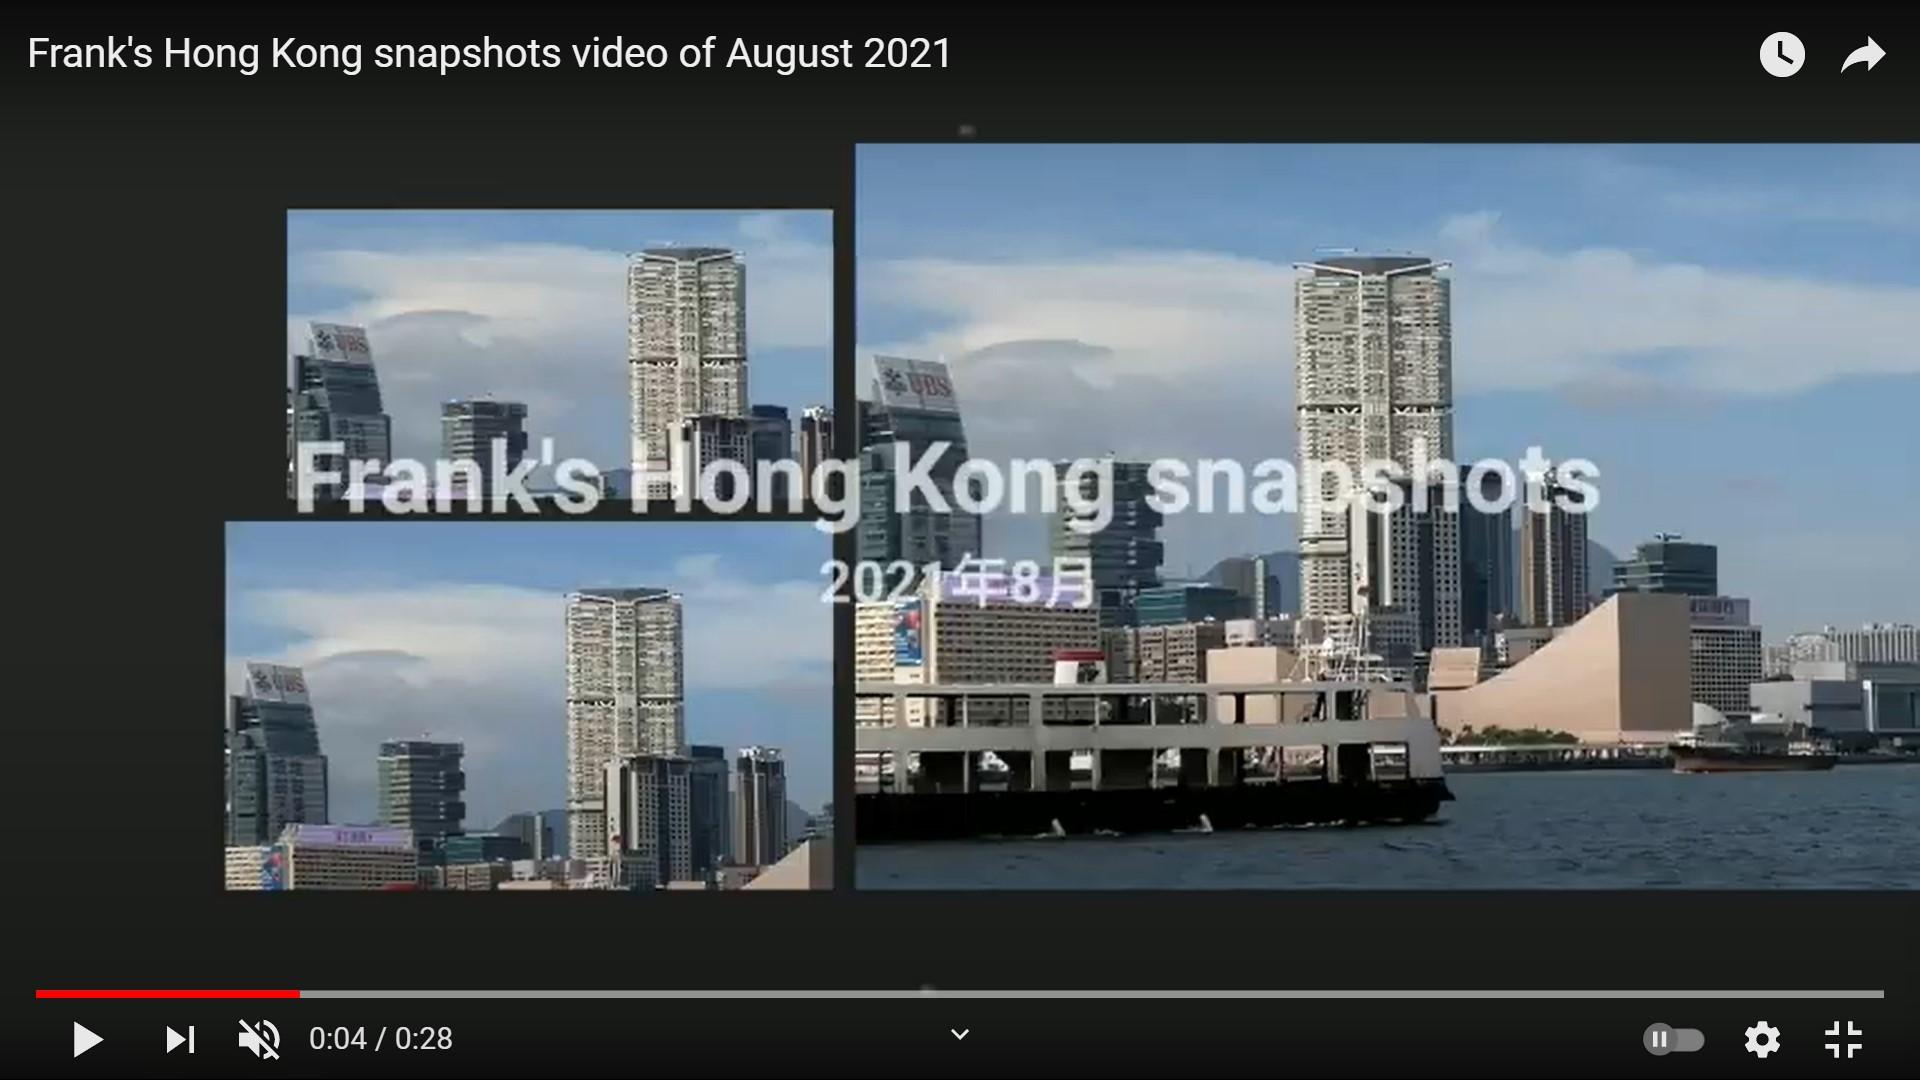 Frank's Hong Kong snapshots video of August 2021